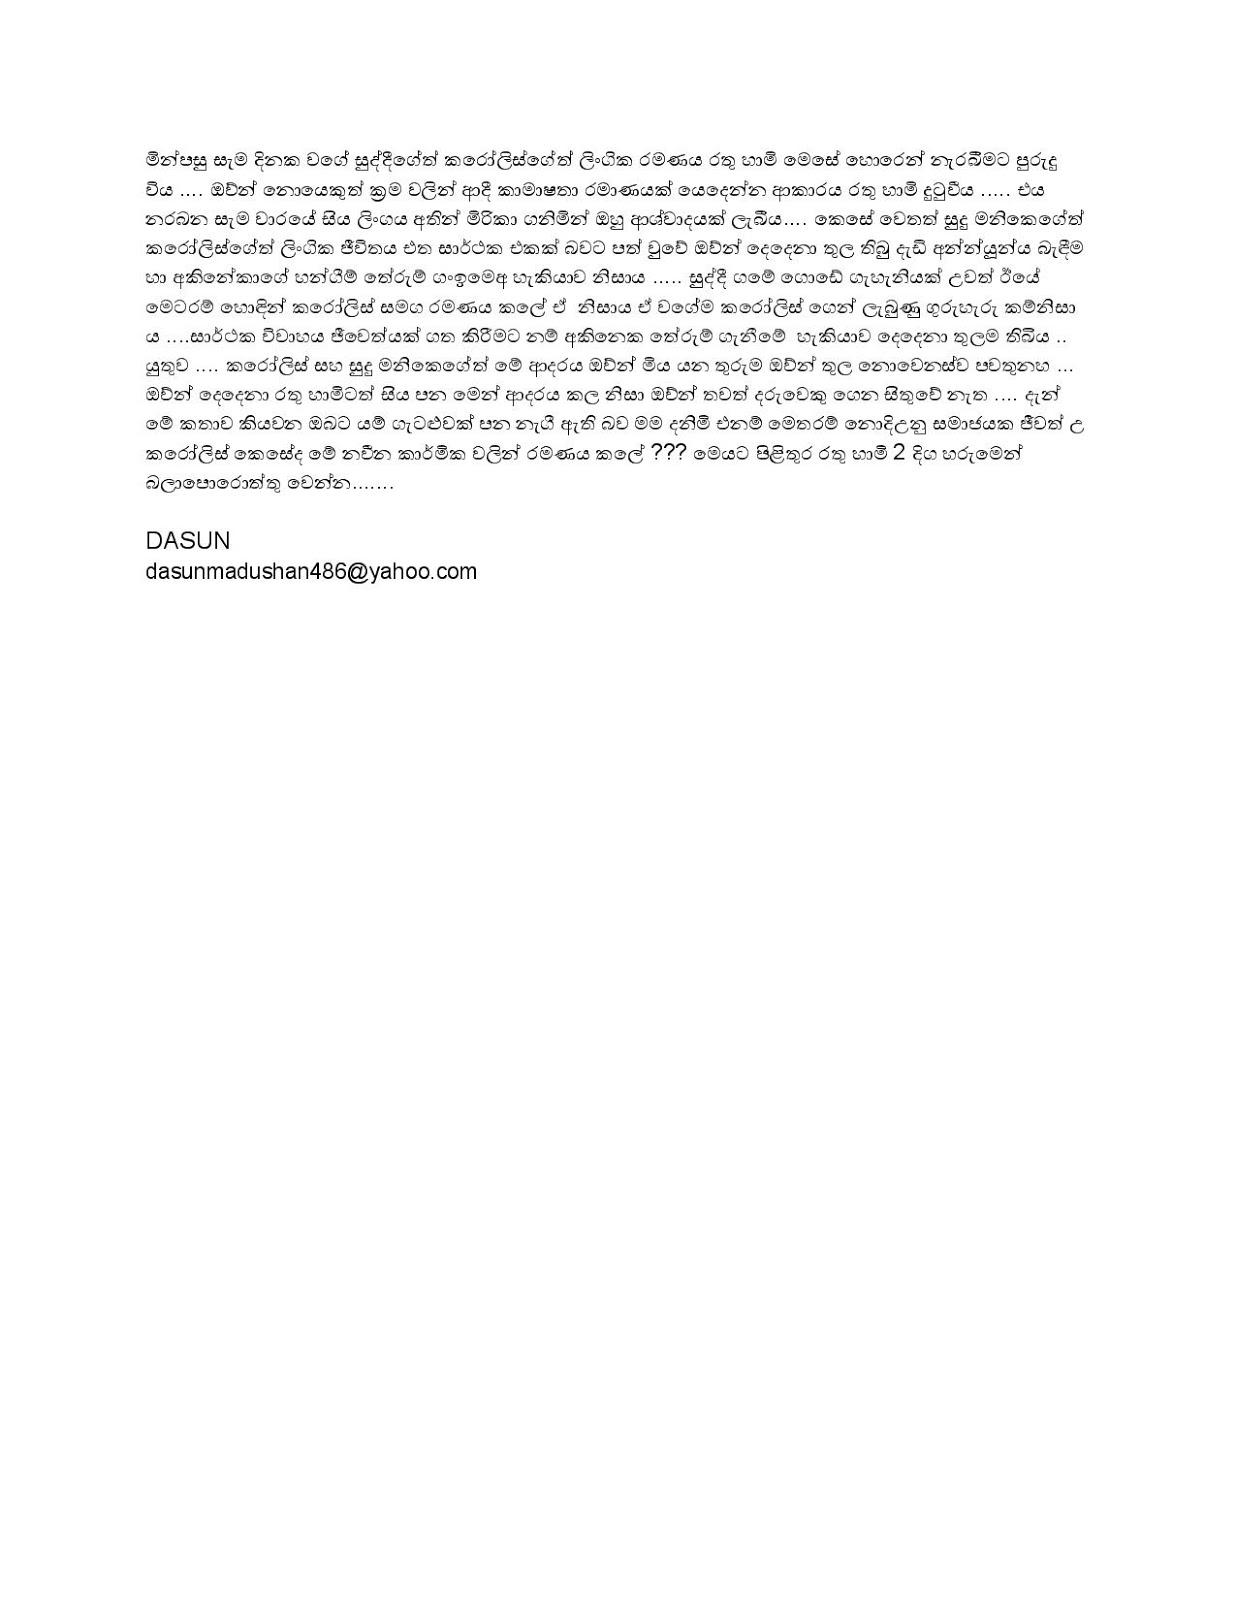 response to rathu hami 1